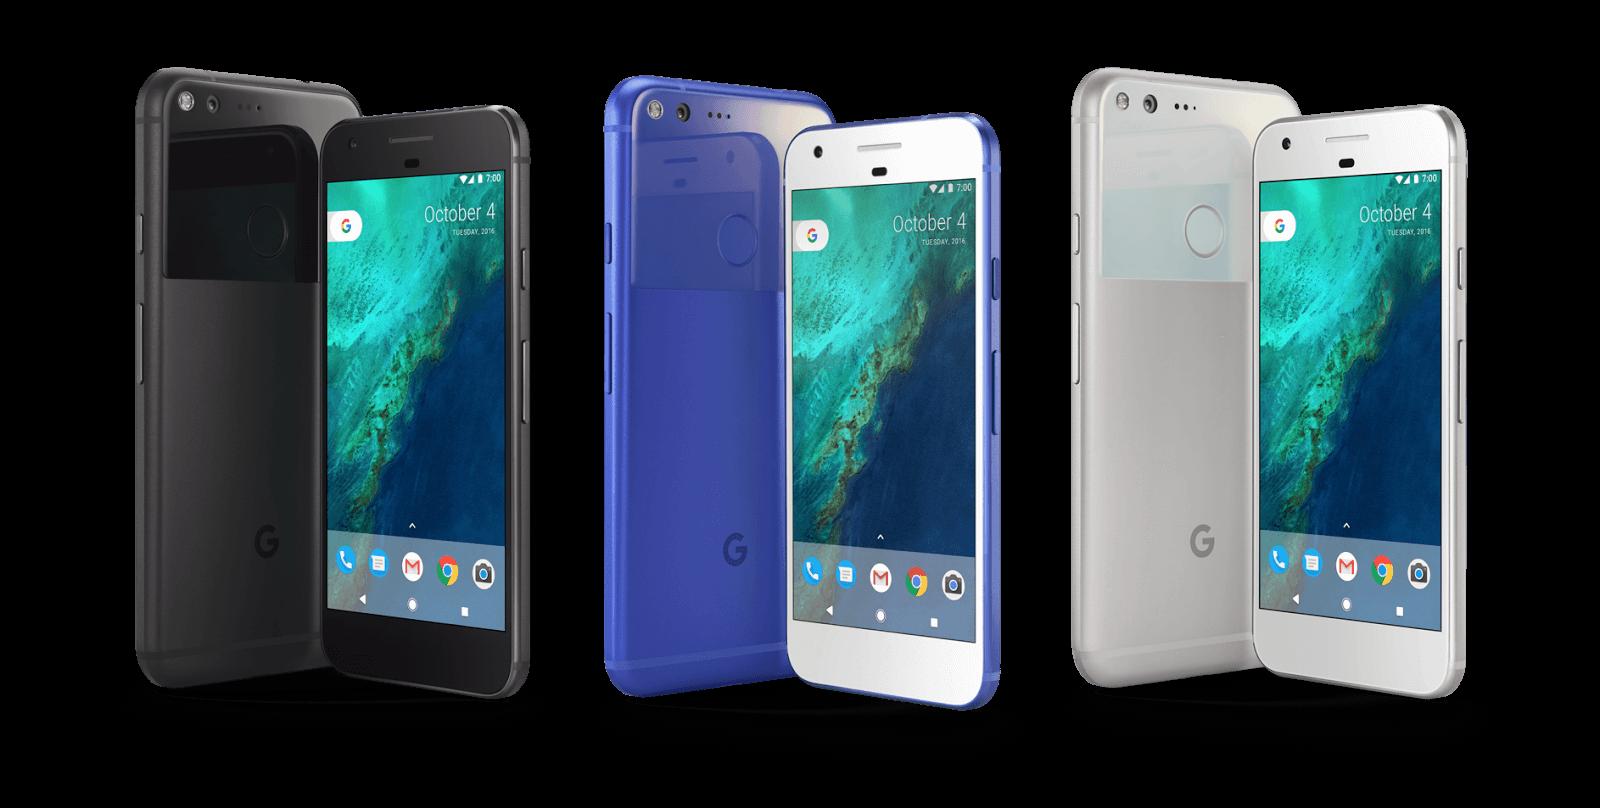 Google Pixel family